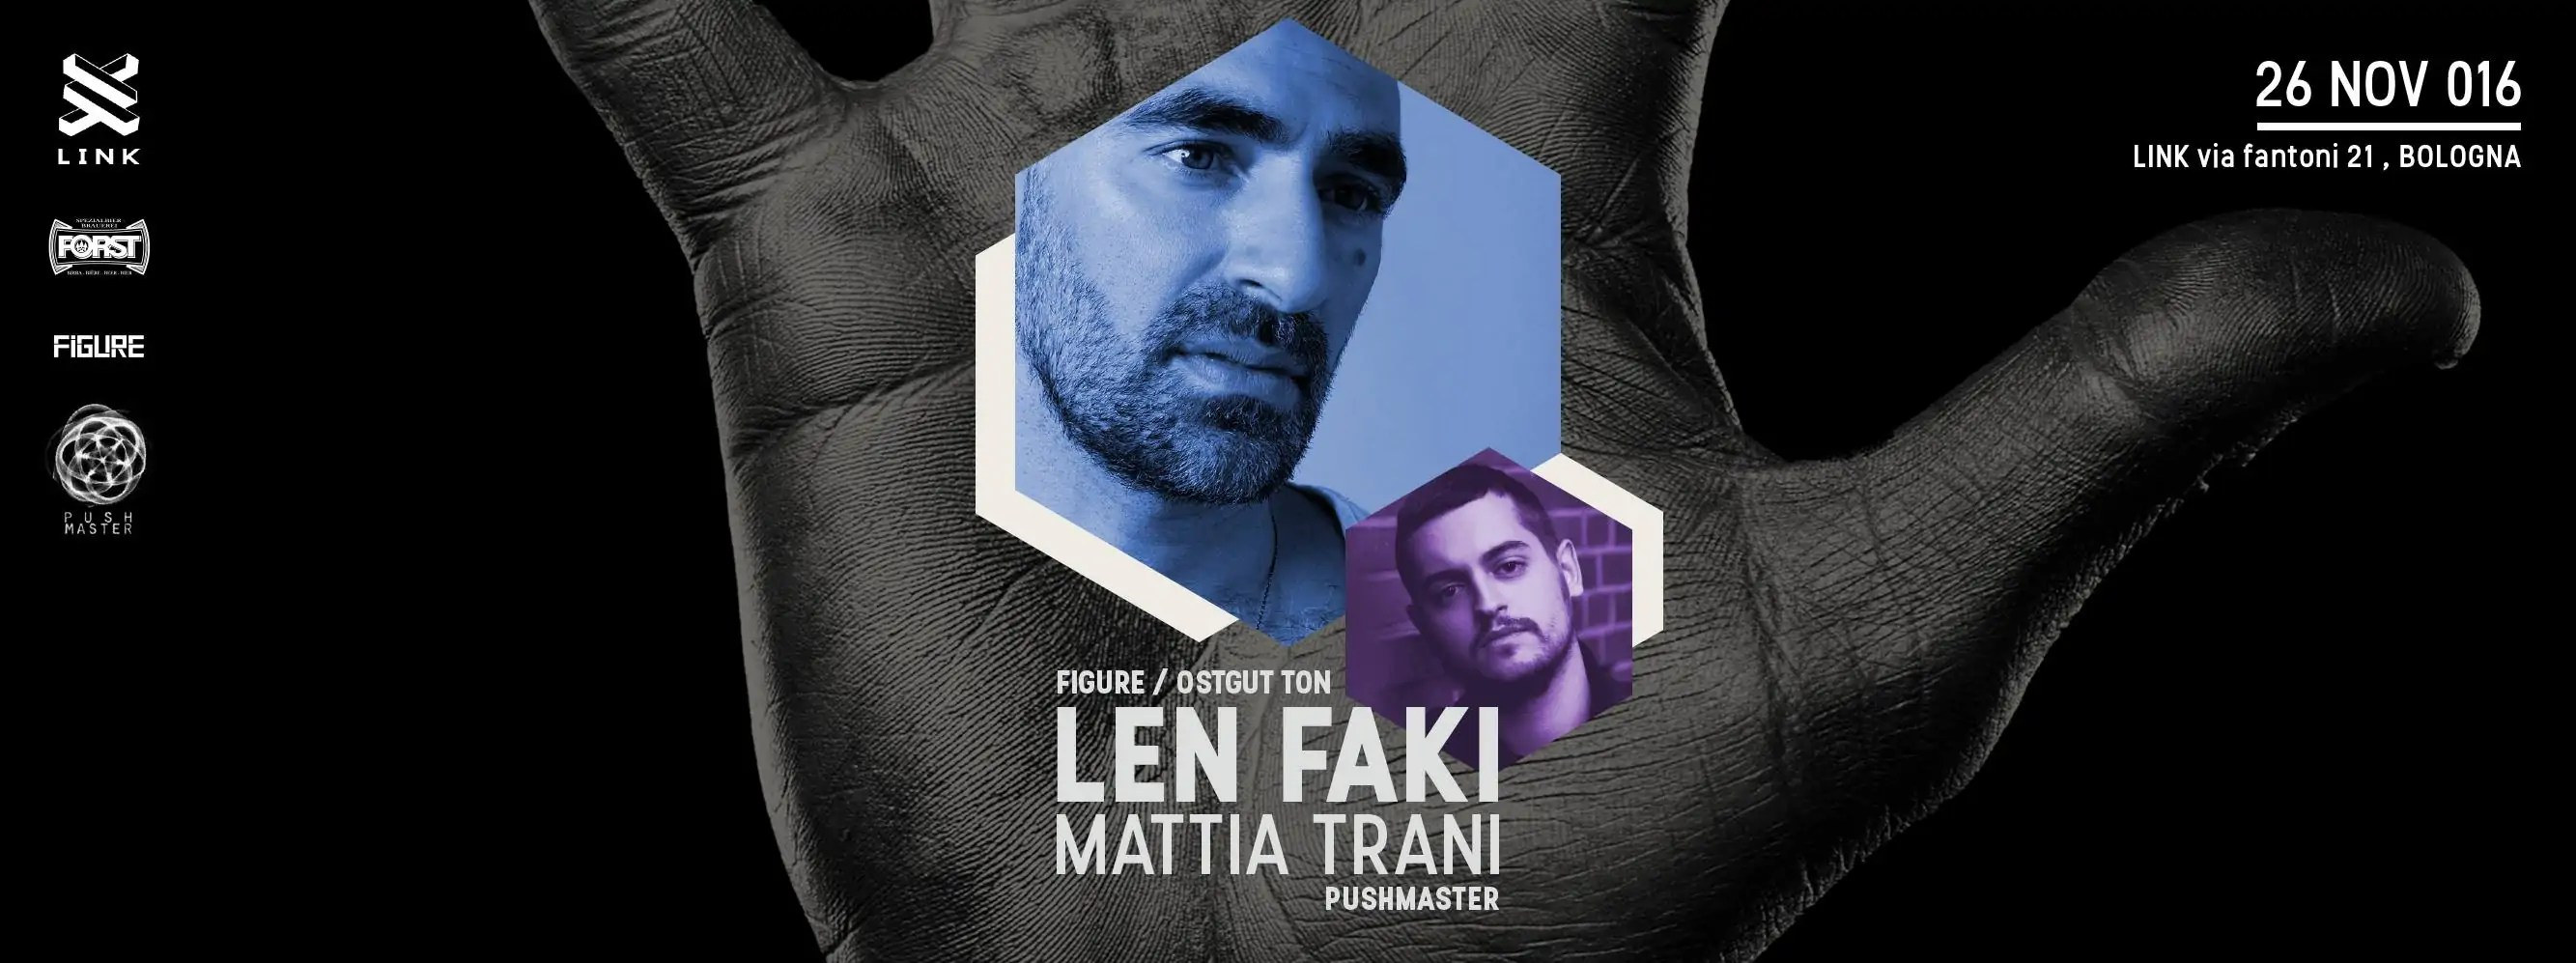 SABATO 26 11 2016 LINK BOLOGNA LEN FAKI + PREZZI PREVENDITE BIGLIETTI TAVOLI + PULLMAN